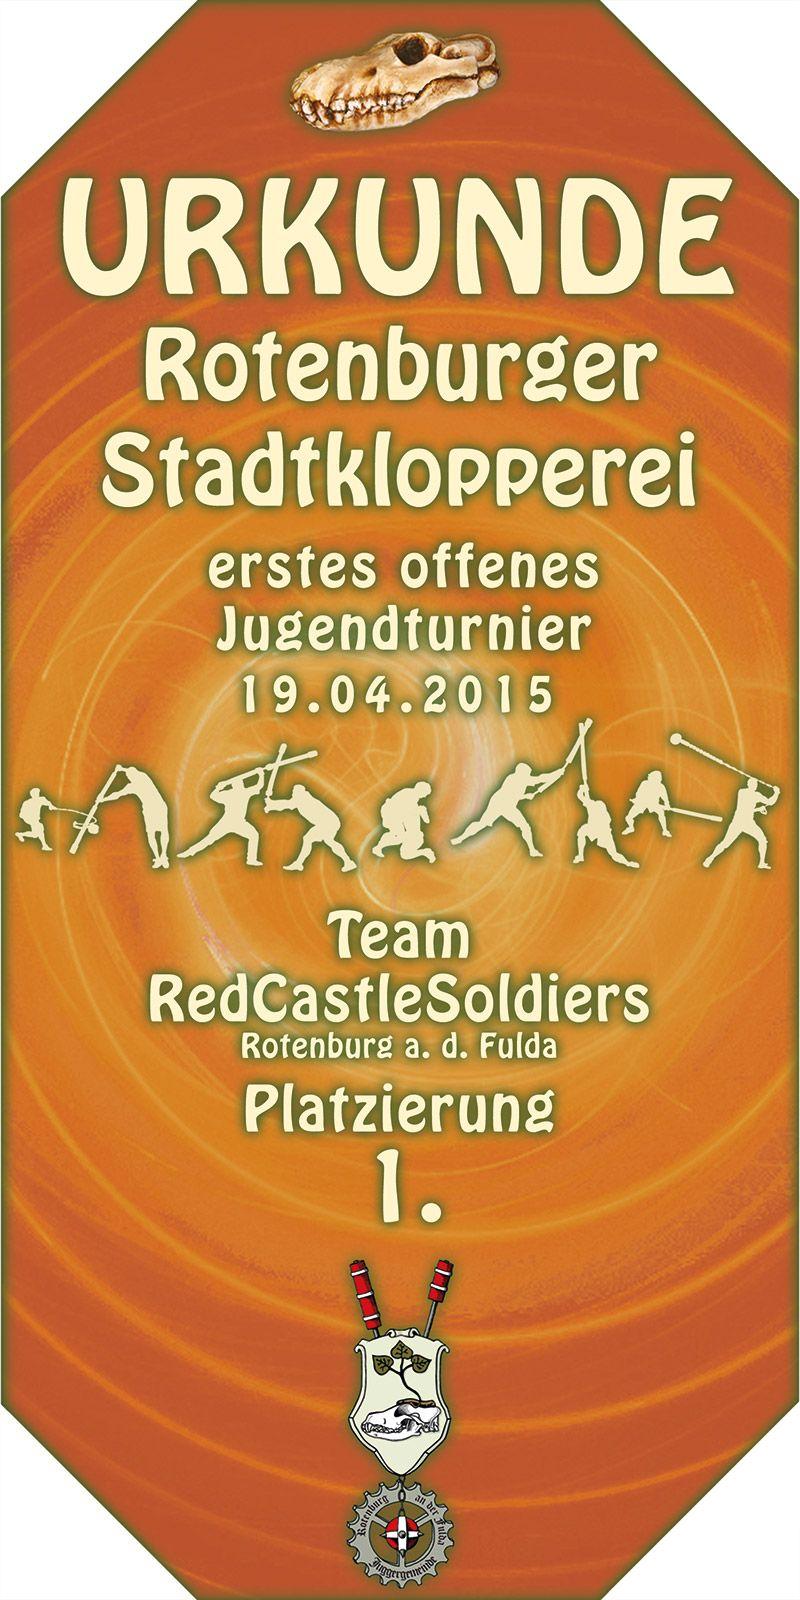 Rotenburger Stadtklopperei 2015, Jugendturnier, Red Castle Soldiers